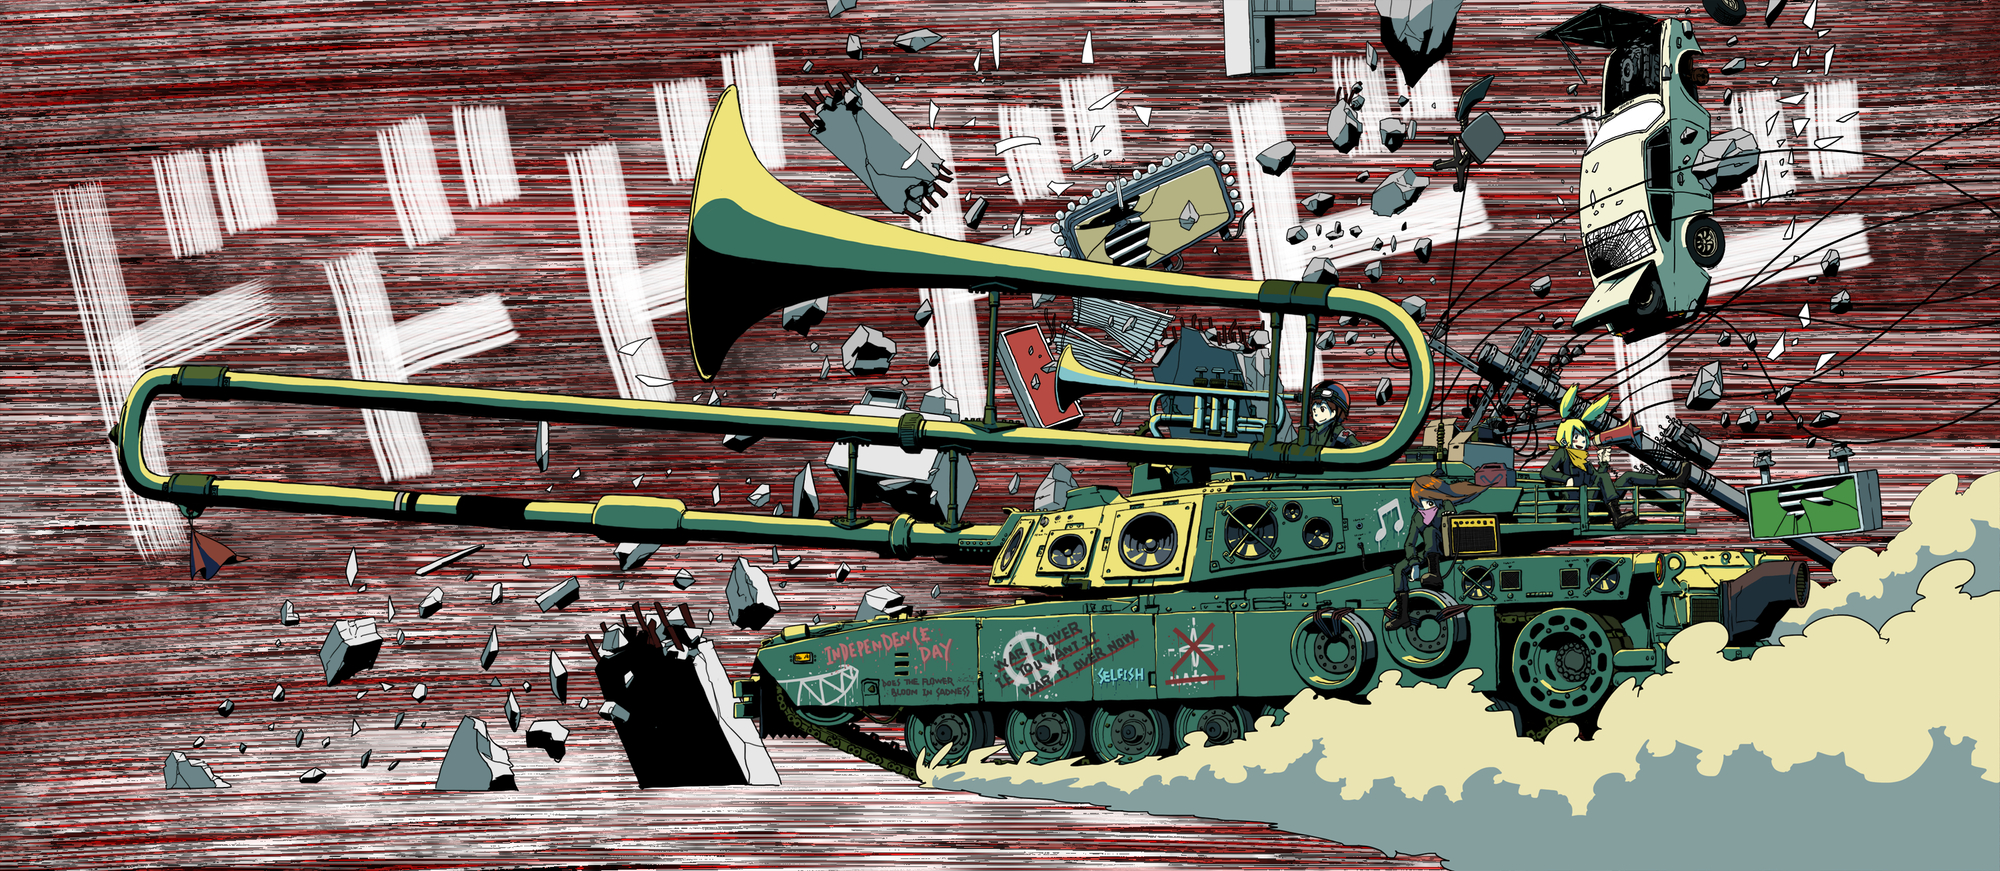 a.hebmuller car combat_vehicle graffiti instrument original ruins